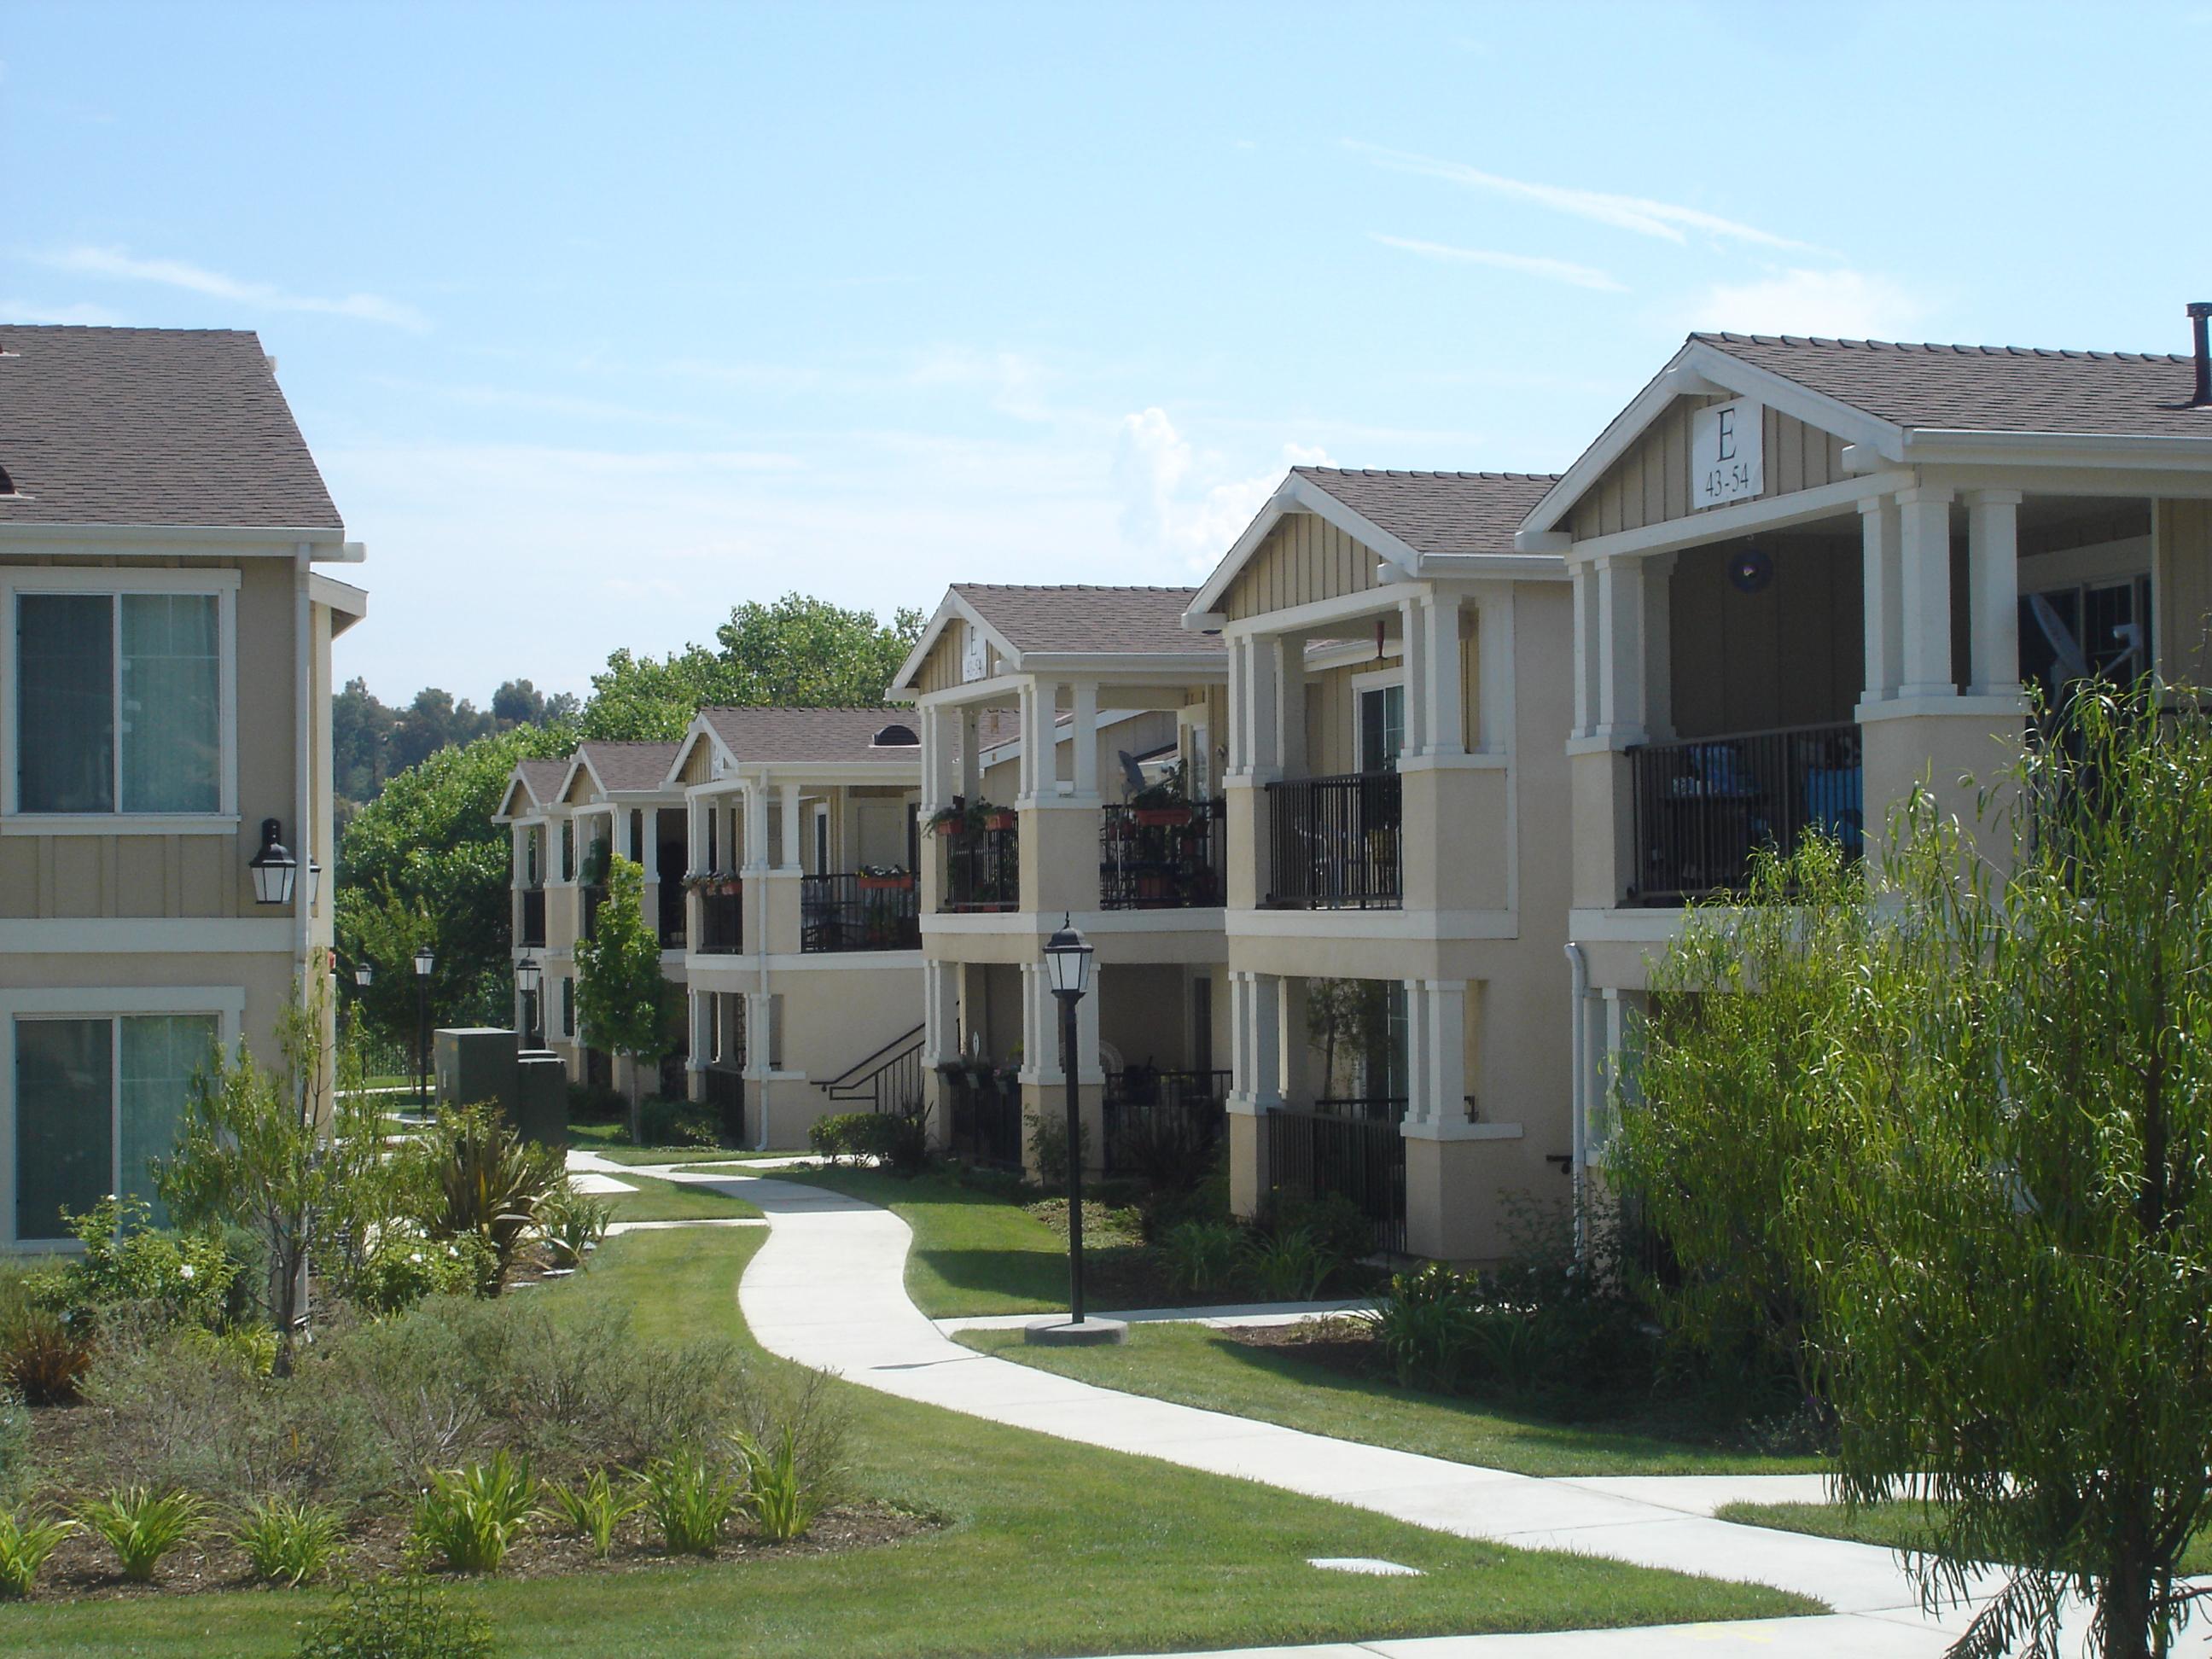 River Bank Village, 28500 Pujol St., Temecula, CA